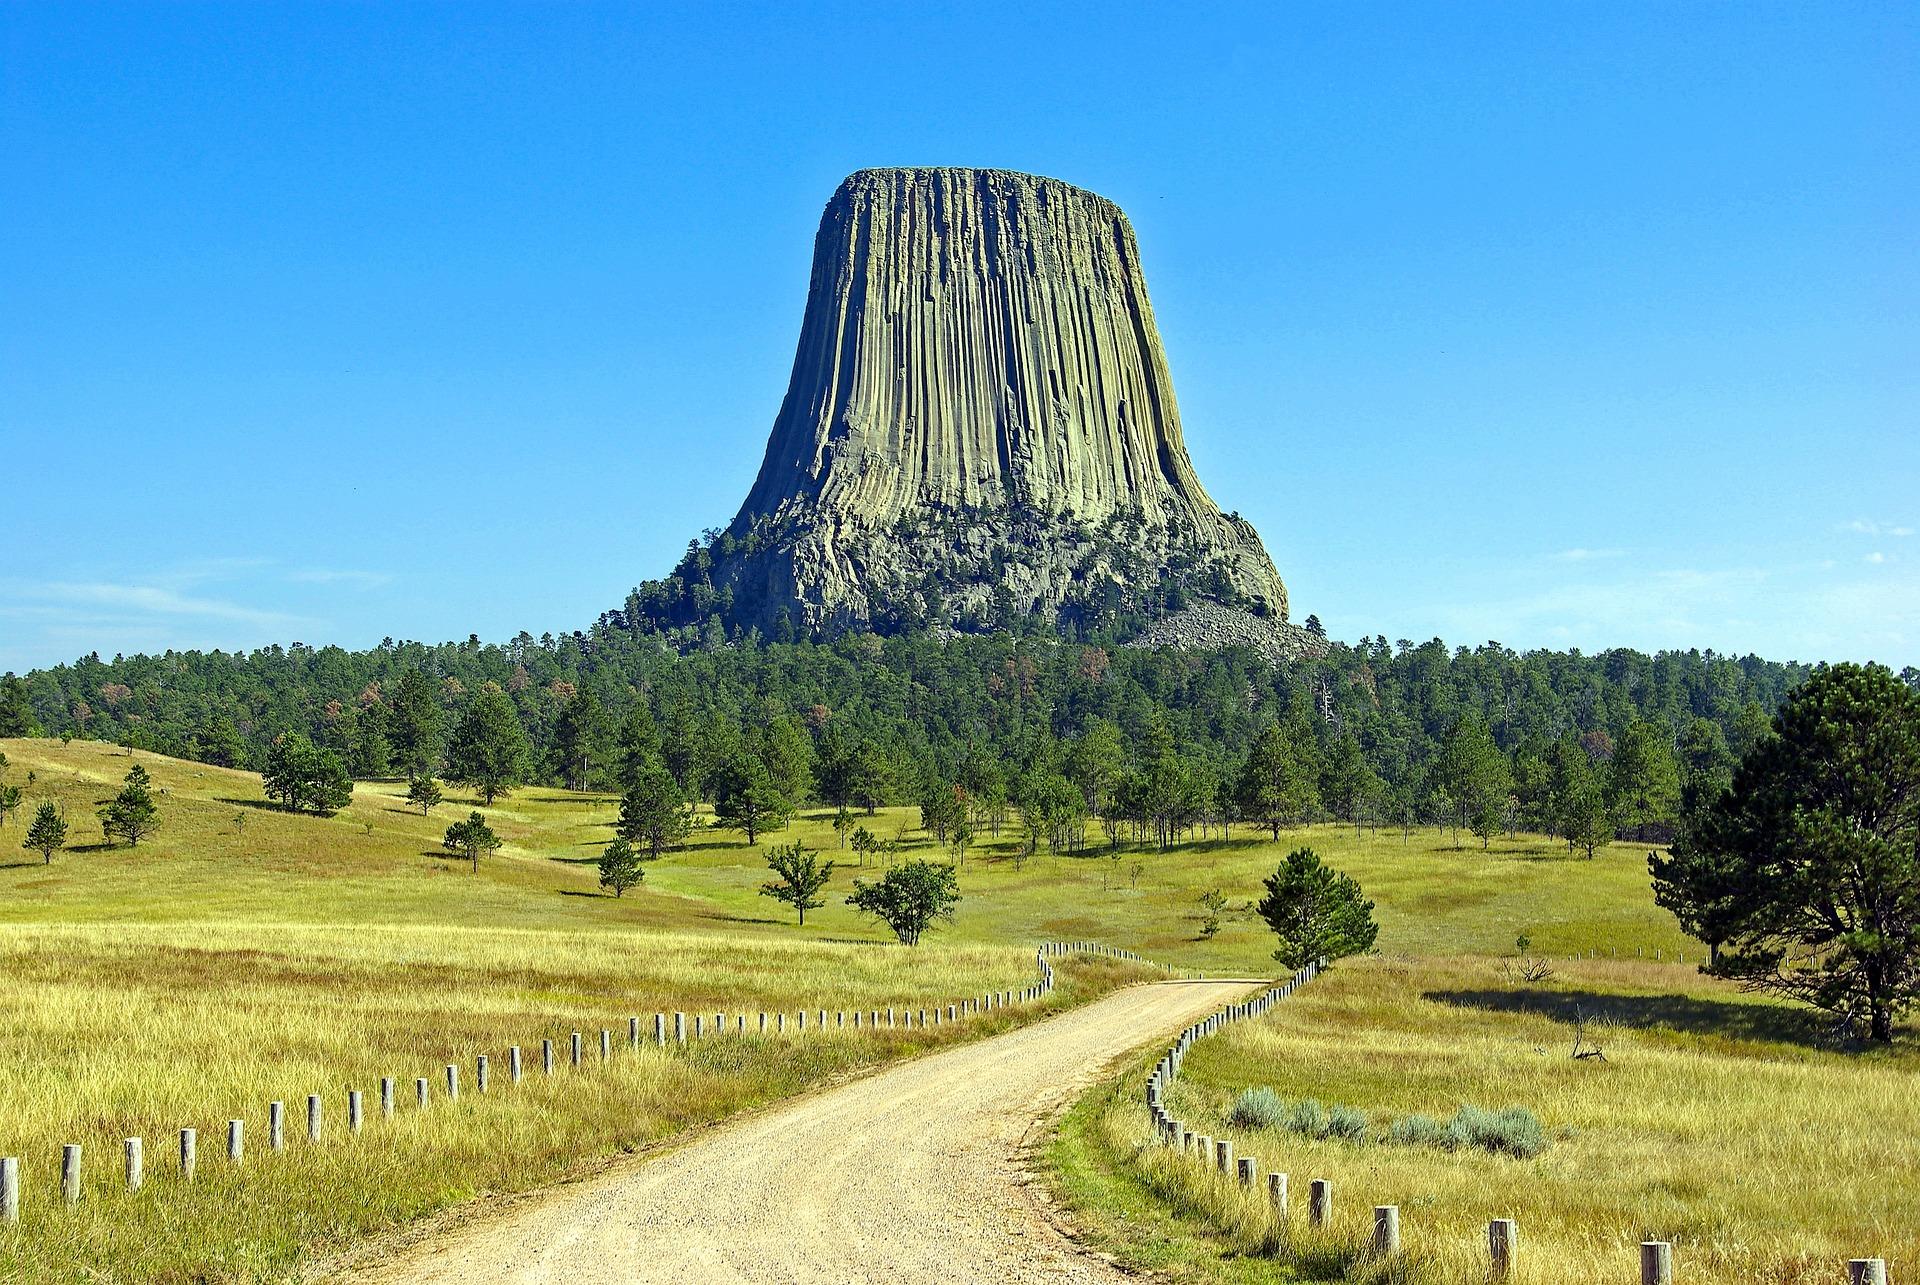 Tree-stump-like stone tower dominates the horizon.